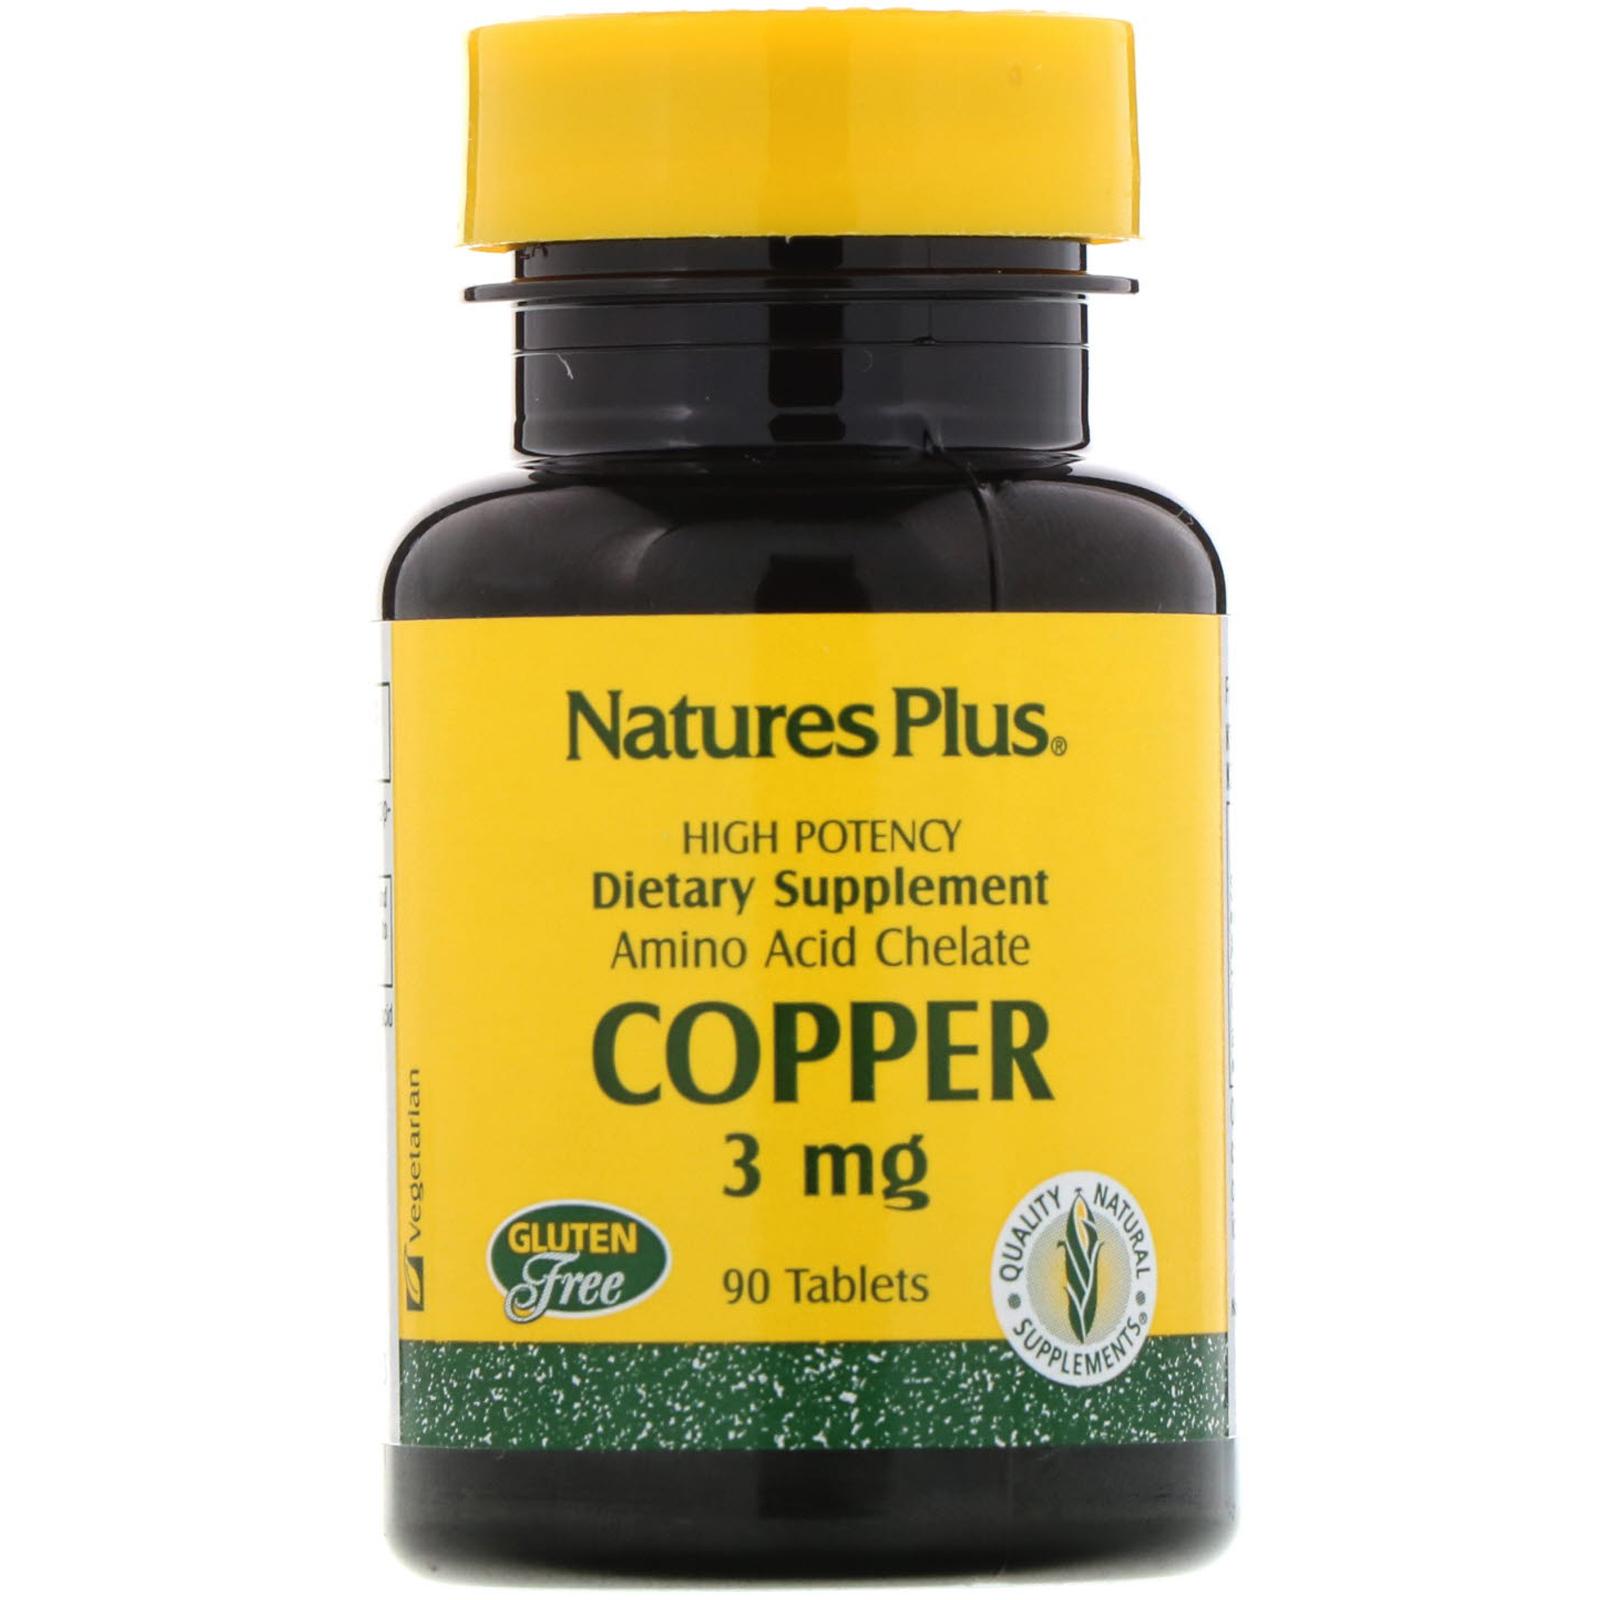 Nature's Plus, Copper, 3 mg, 90 Tablets - iHerb com